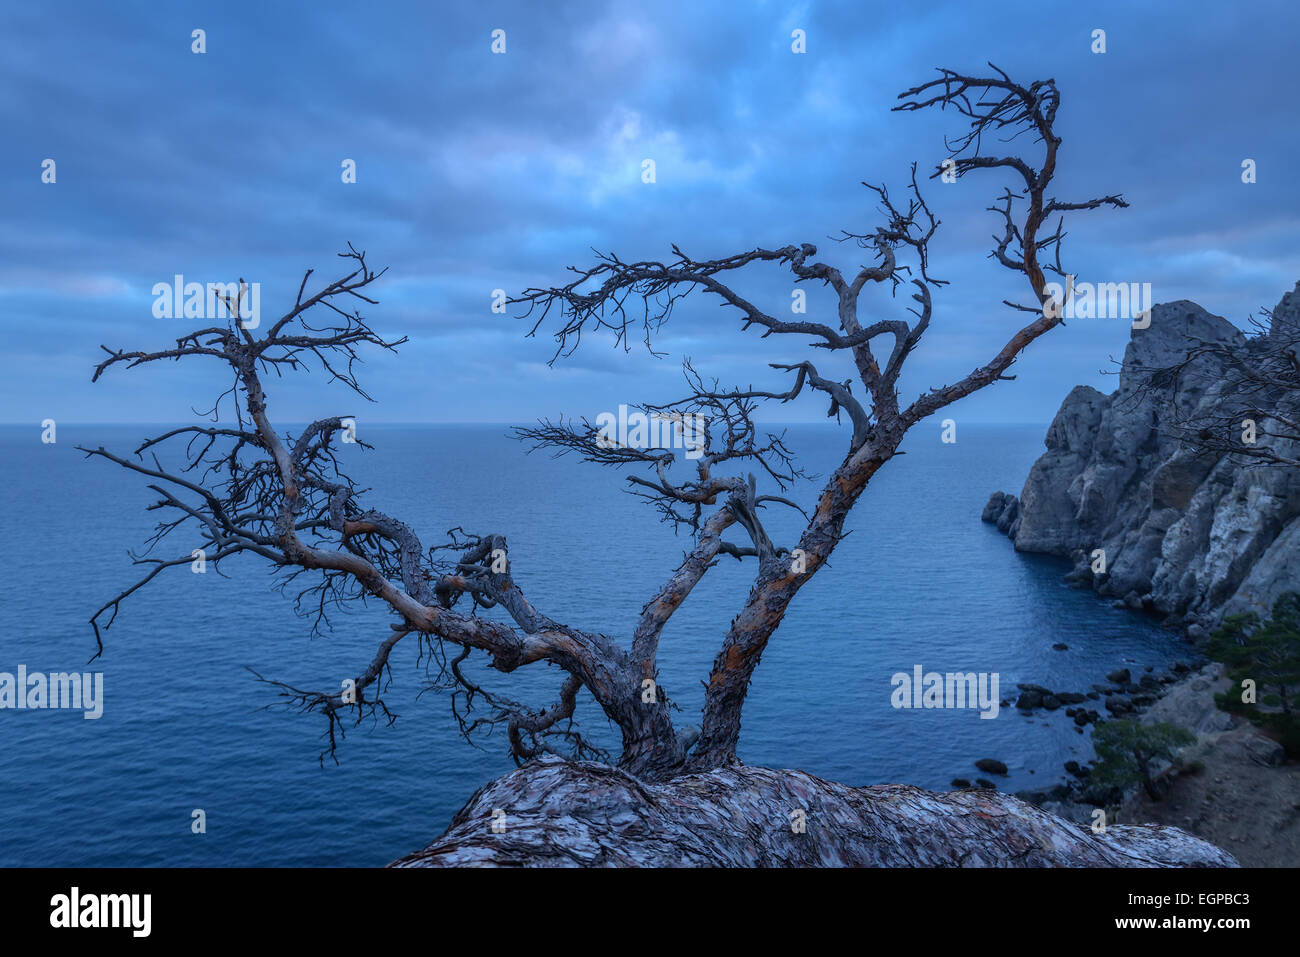 Tree on rock in Crimea - Stock Image